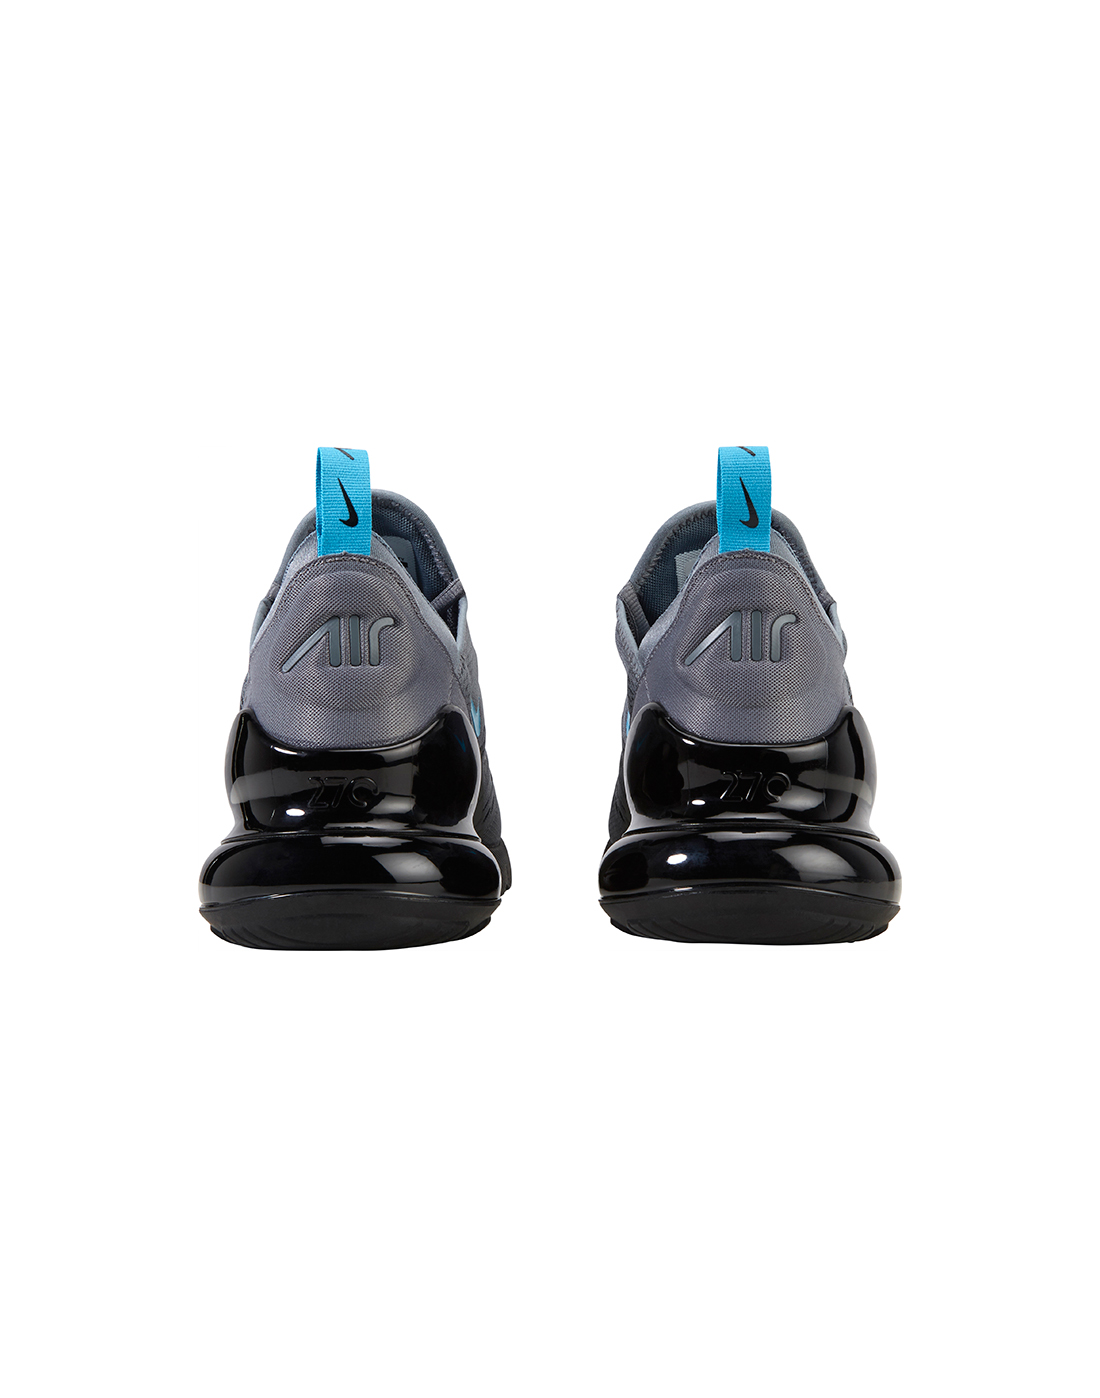 cab7bd4c2a Men's Grey & Blue Nike Air Max 270 | Life Style Sports